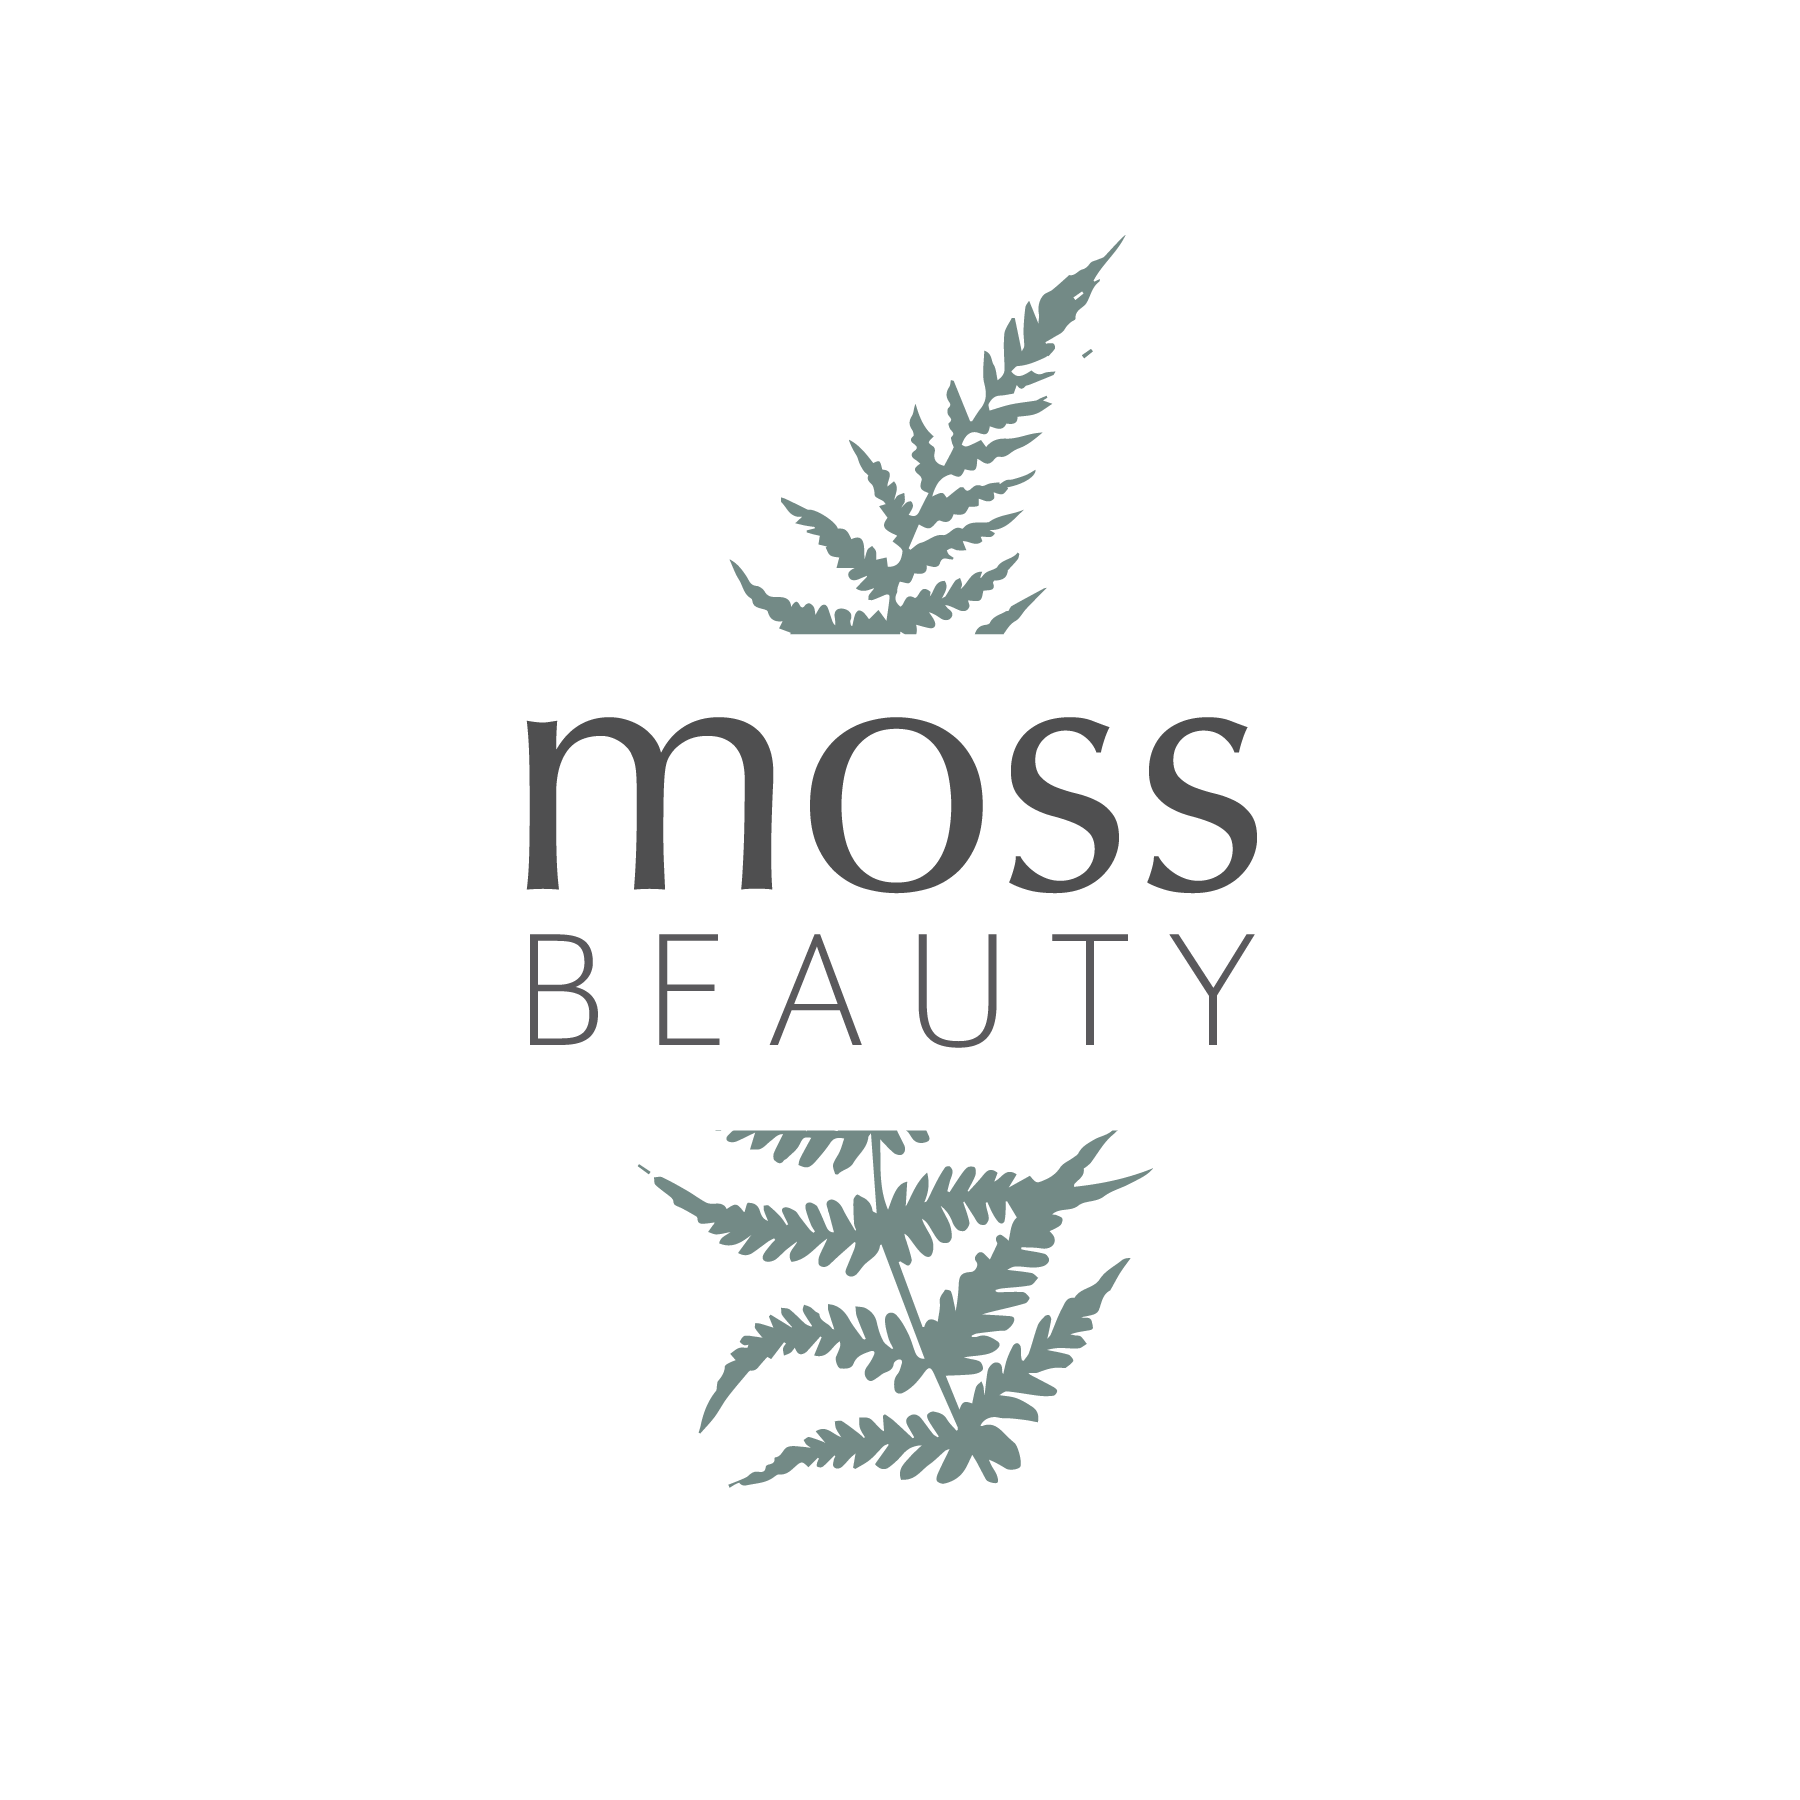 moss2.png